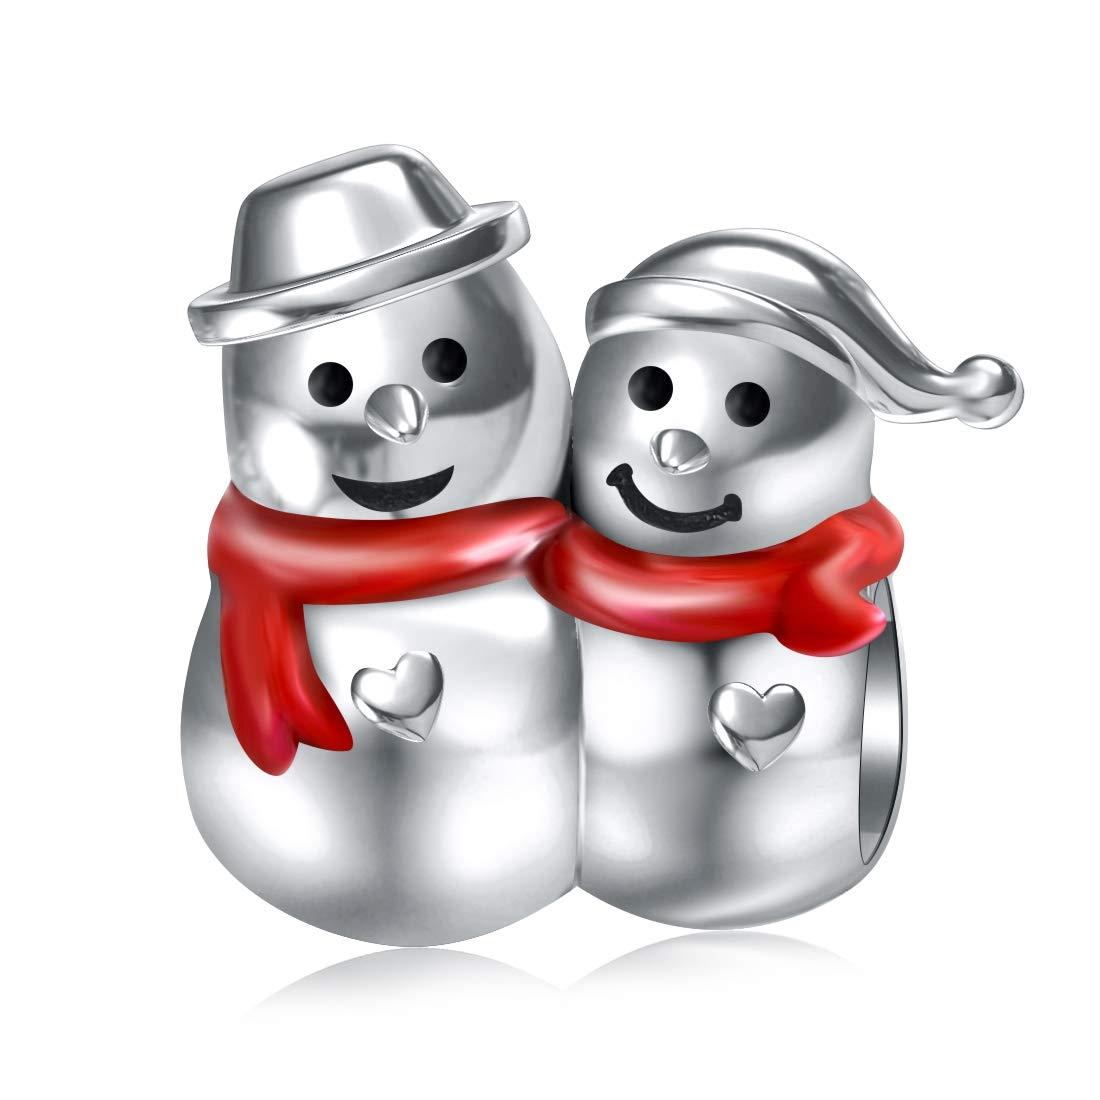 JIAYIQI Christmas Snowman Charm Fit Pandora Charms Bracelets,925 Sterling Silver Xmas Gifts Bead Fit Bracelet